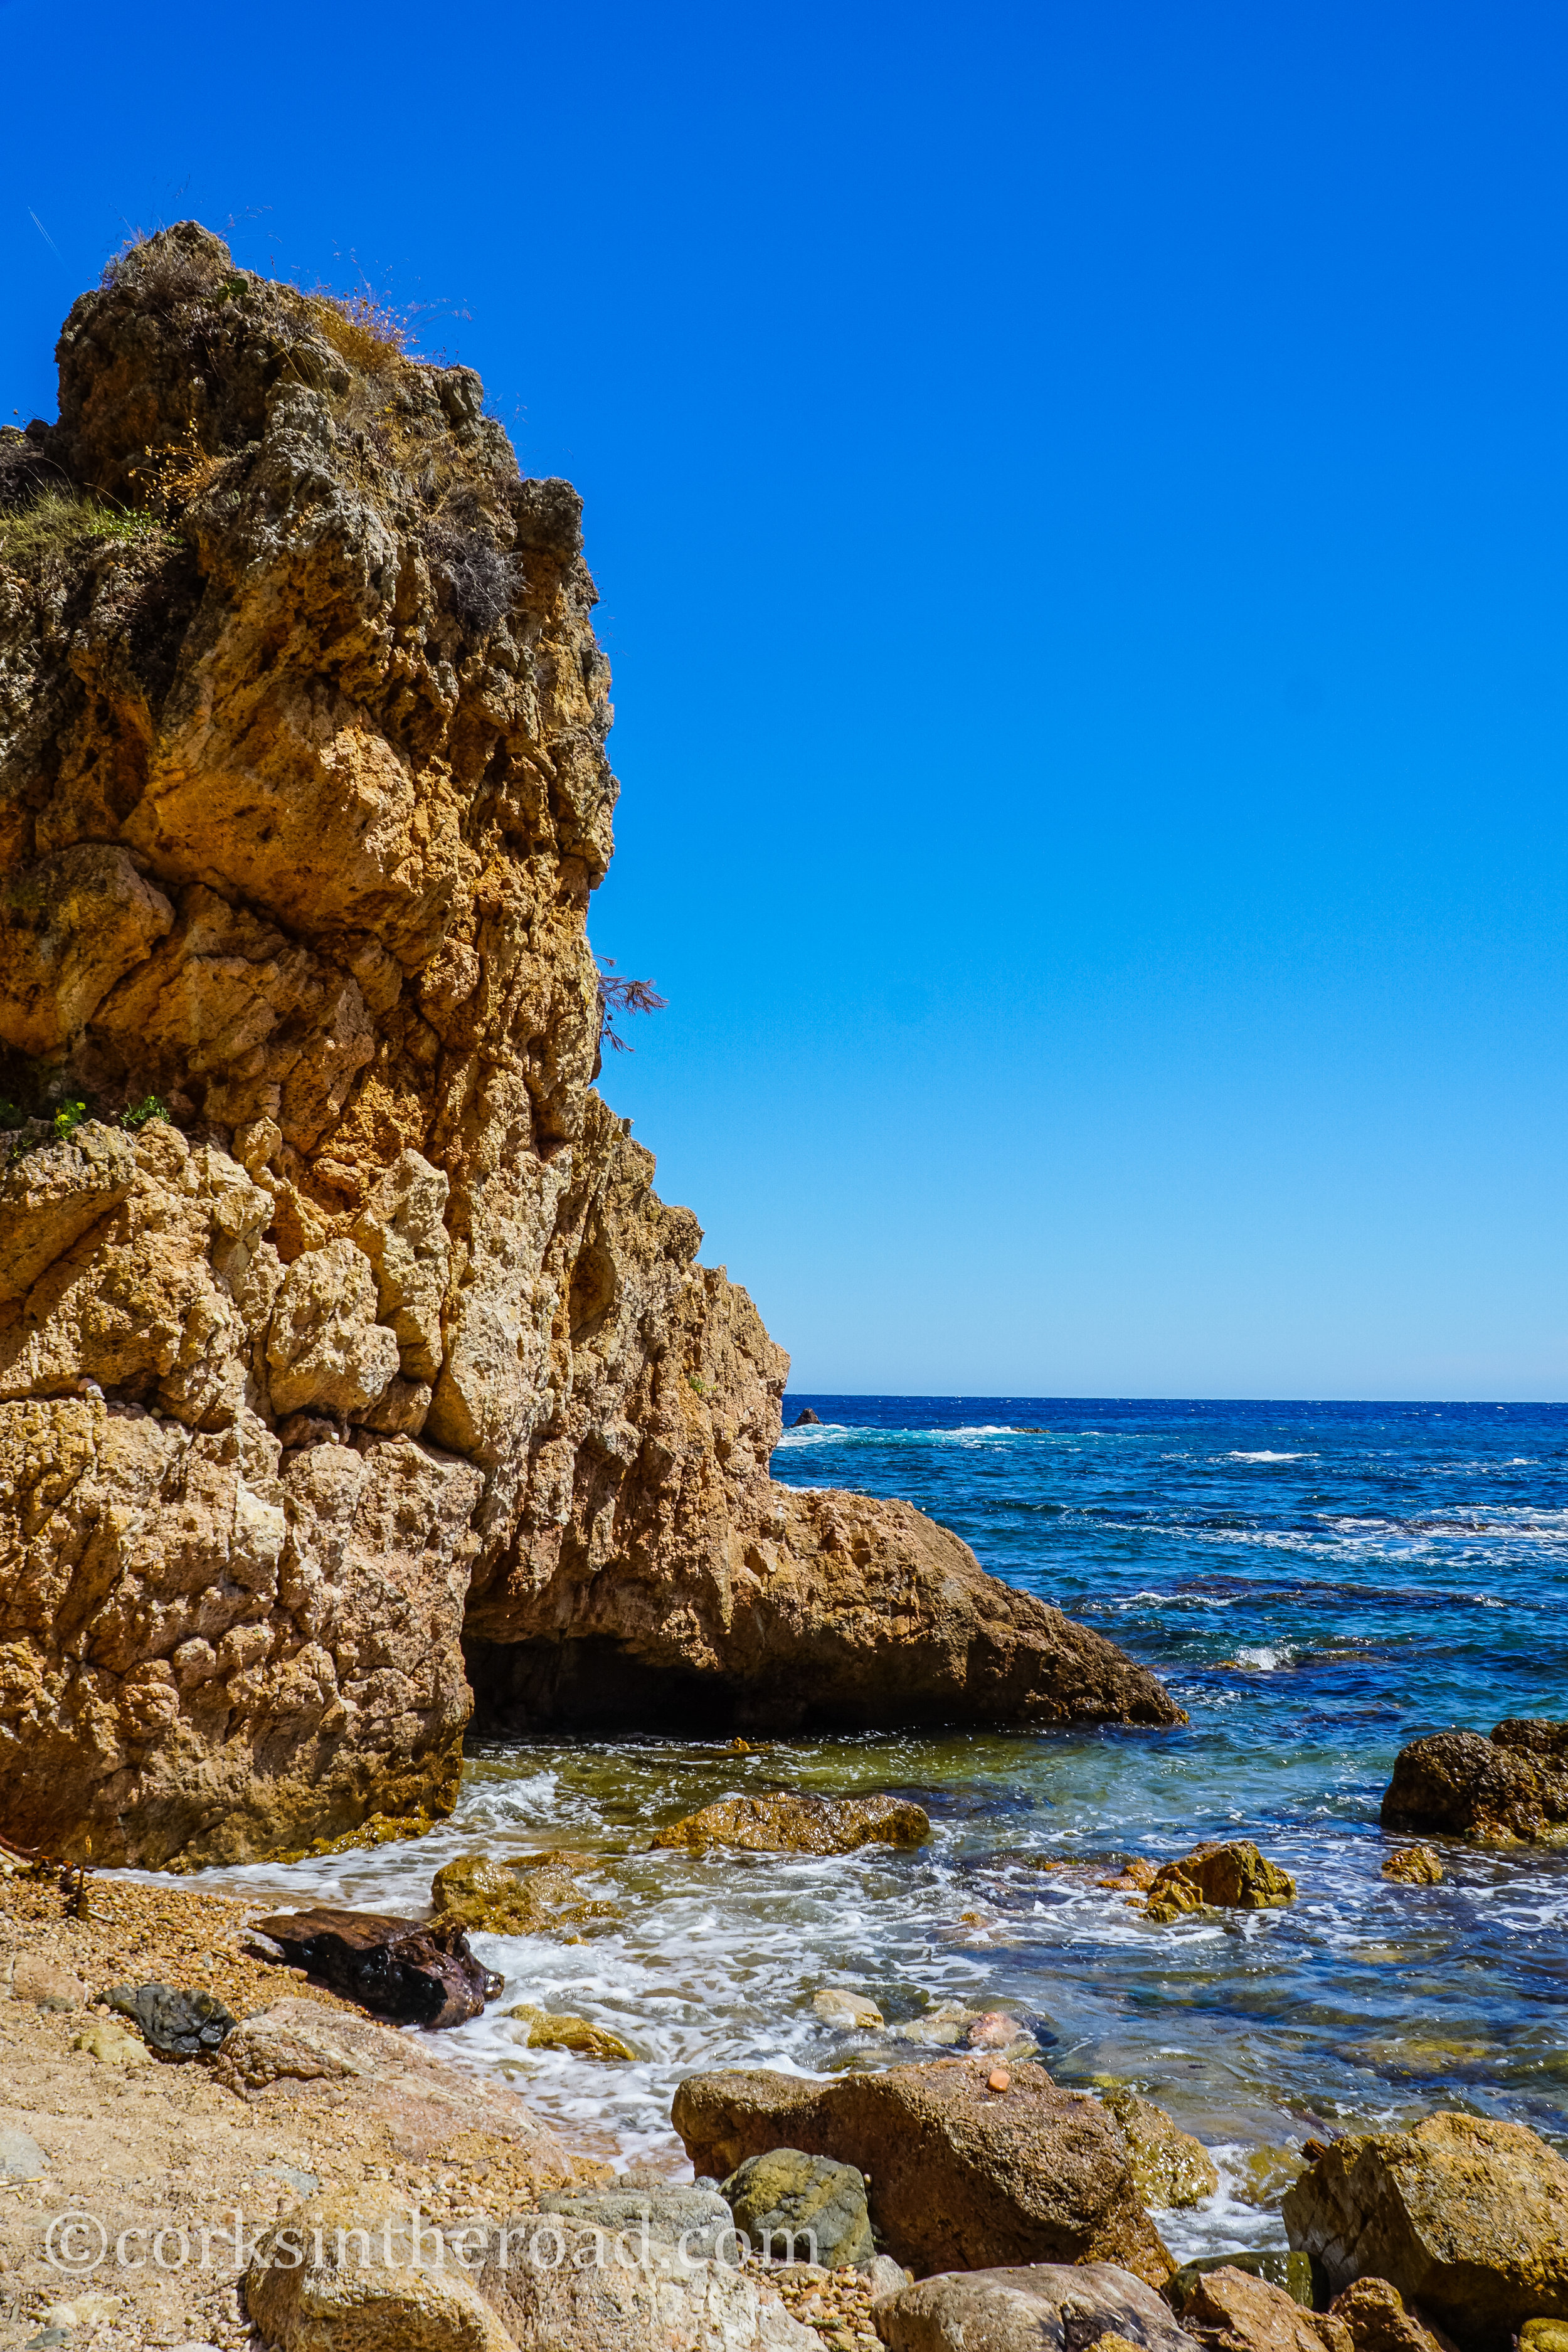 20160810Barcelona, Corksintheroad, Costa Brava, Costa Brava Landscape-36.jpg